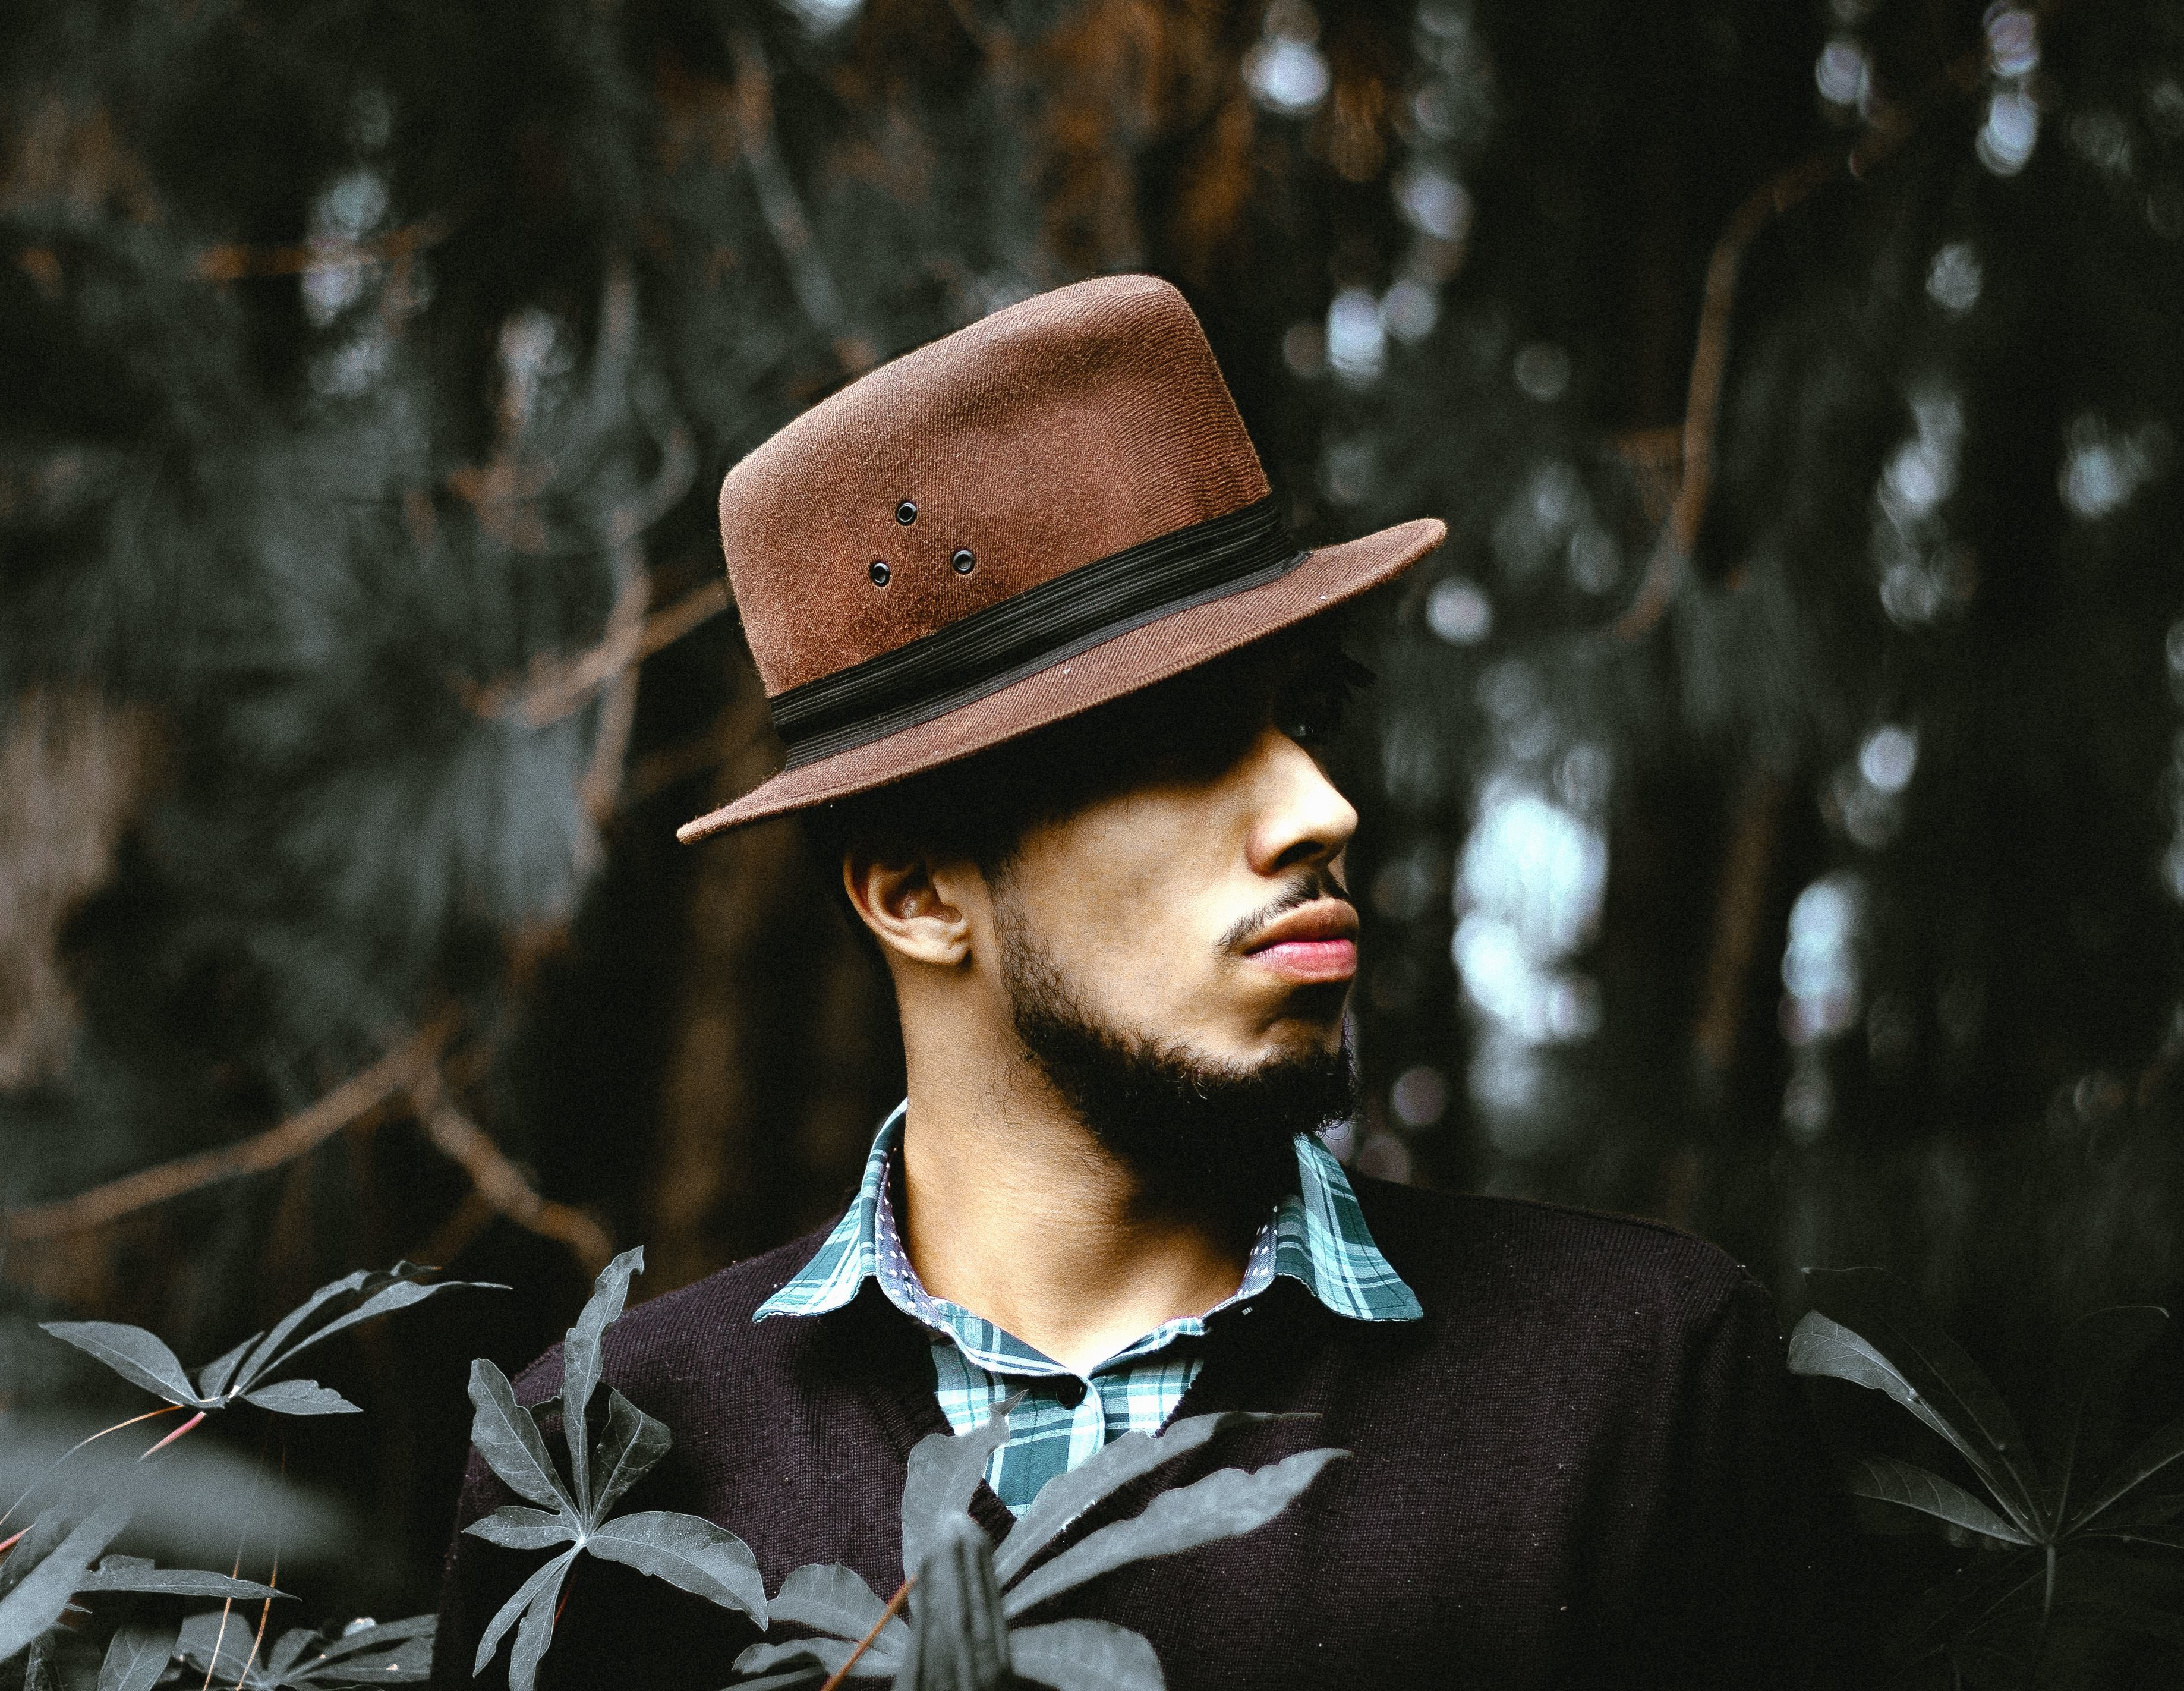 Free Picture Man Photo Model Hat Fashion Forest Portrait